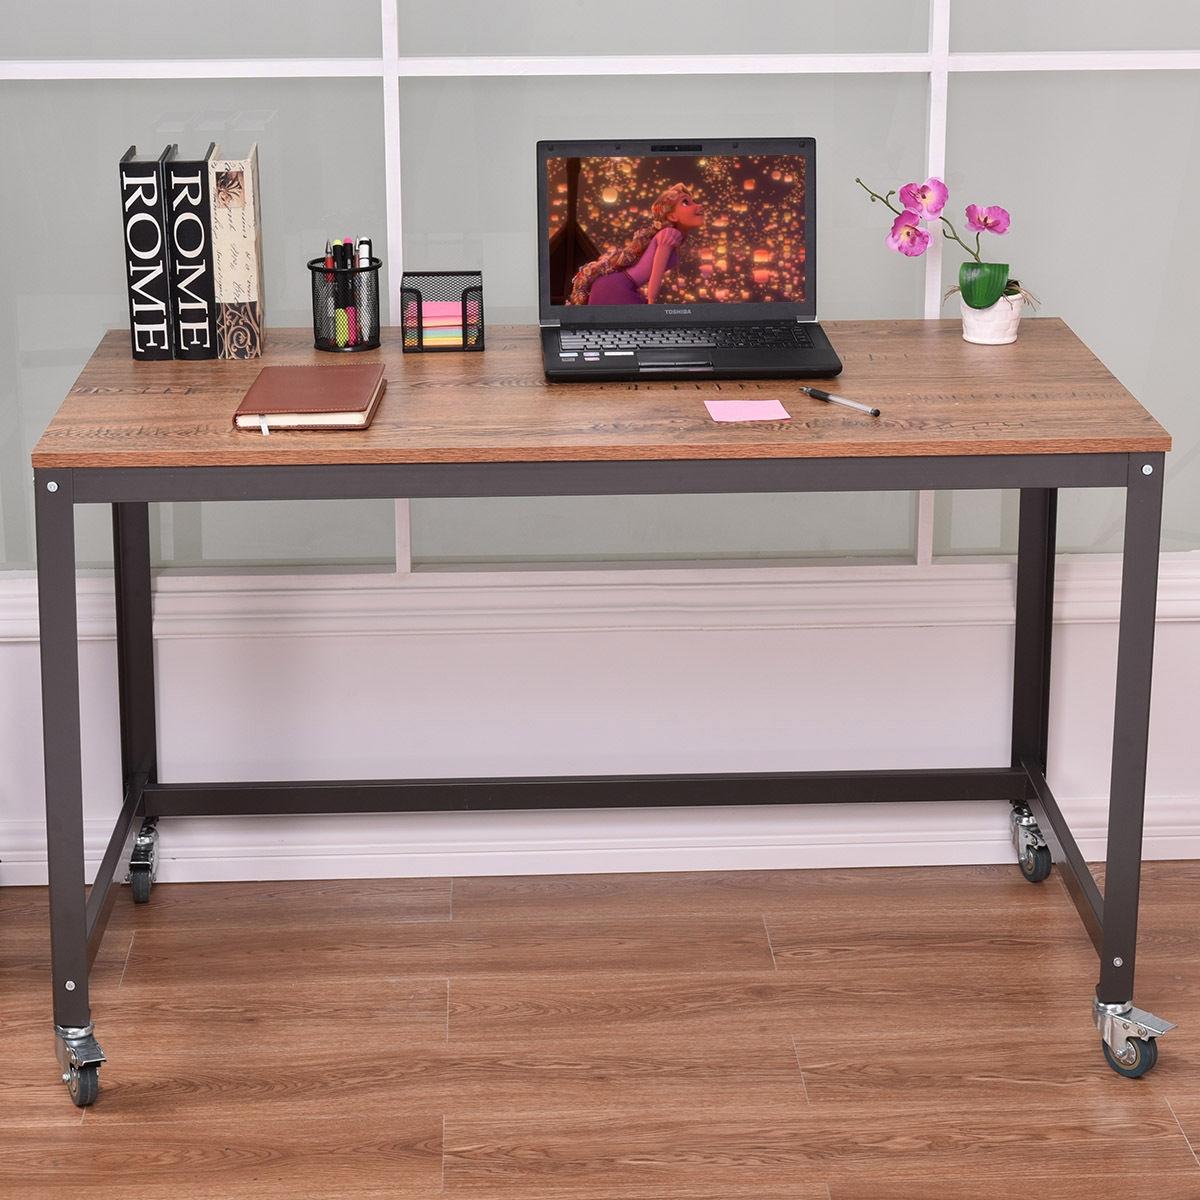 Image of Wood Top Metal Frame Rolling Computer Desk Laptop Table